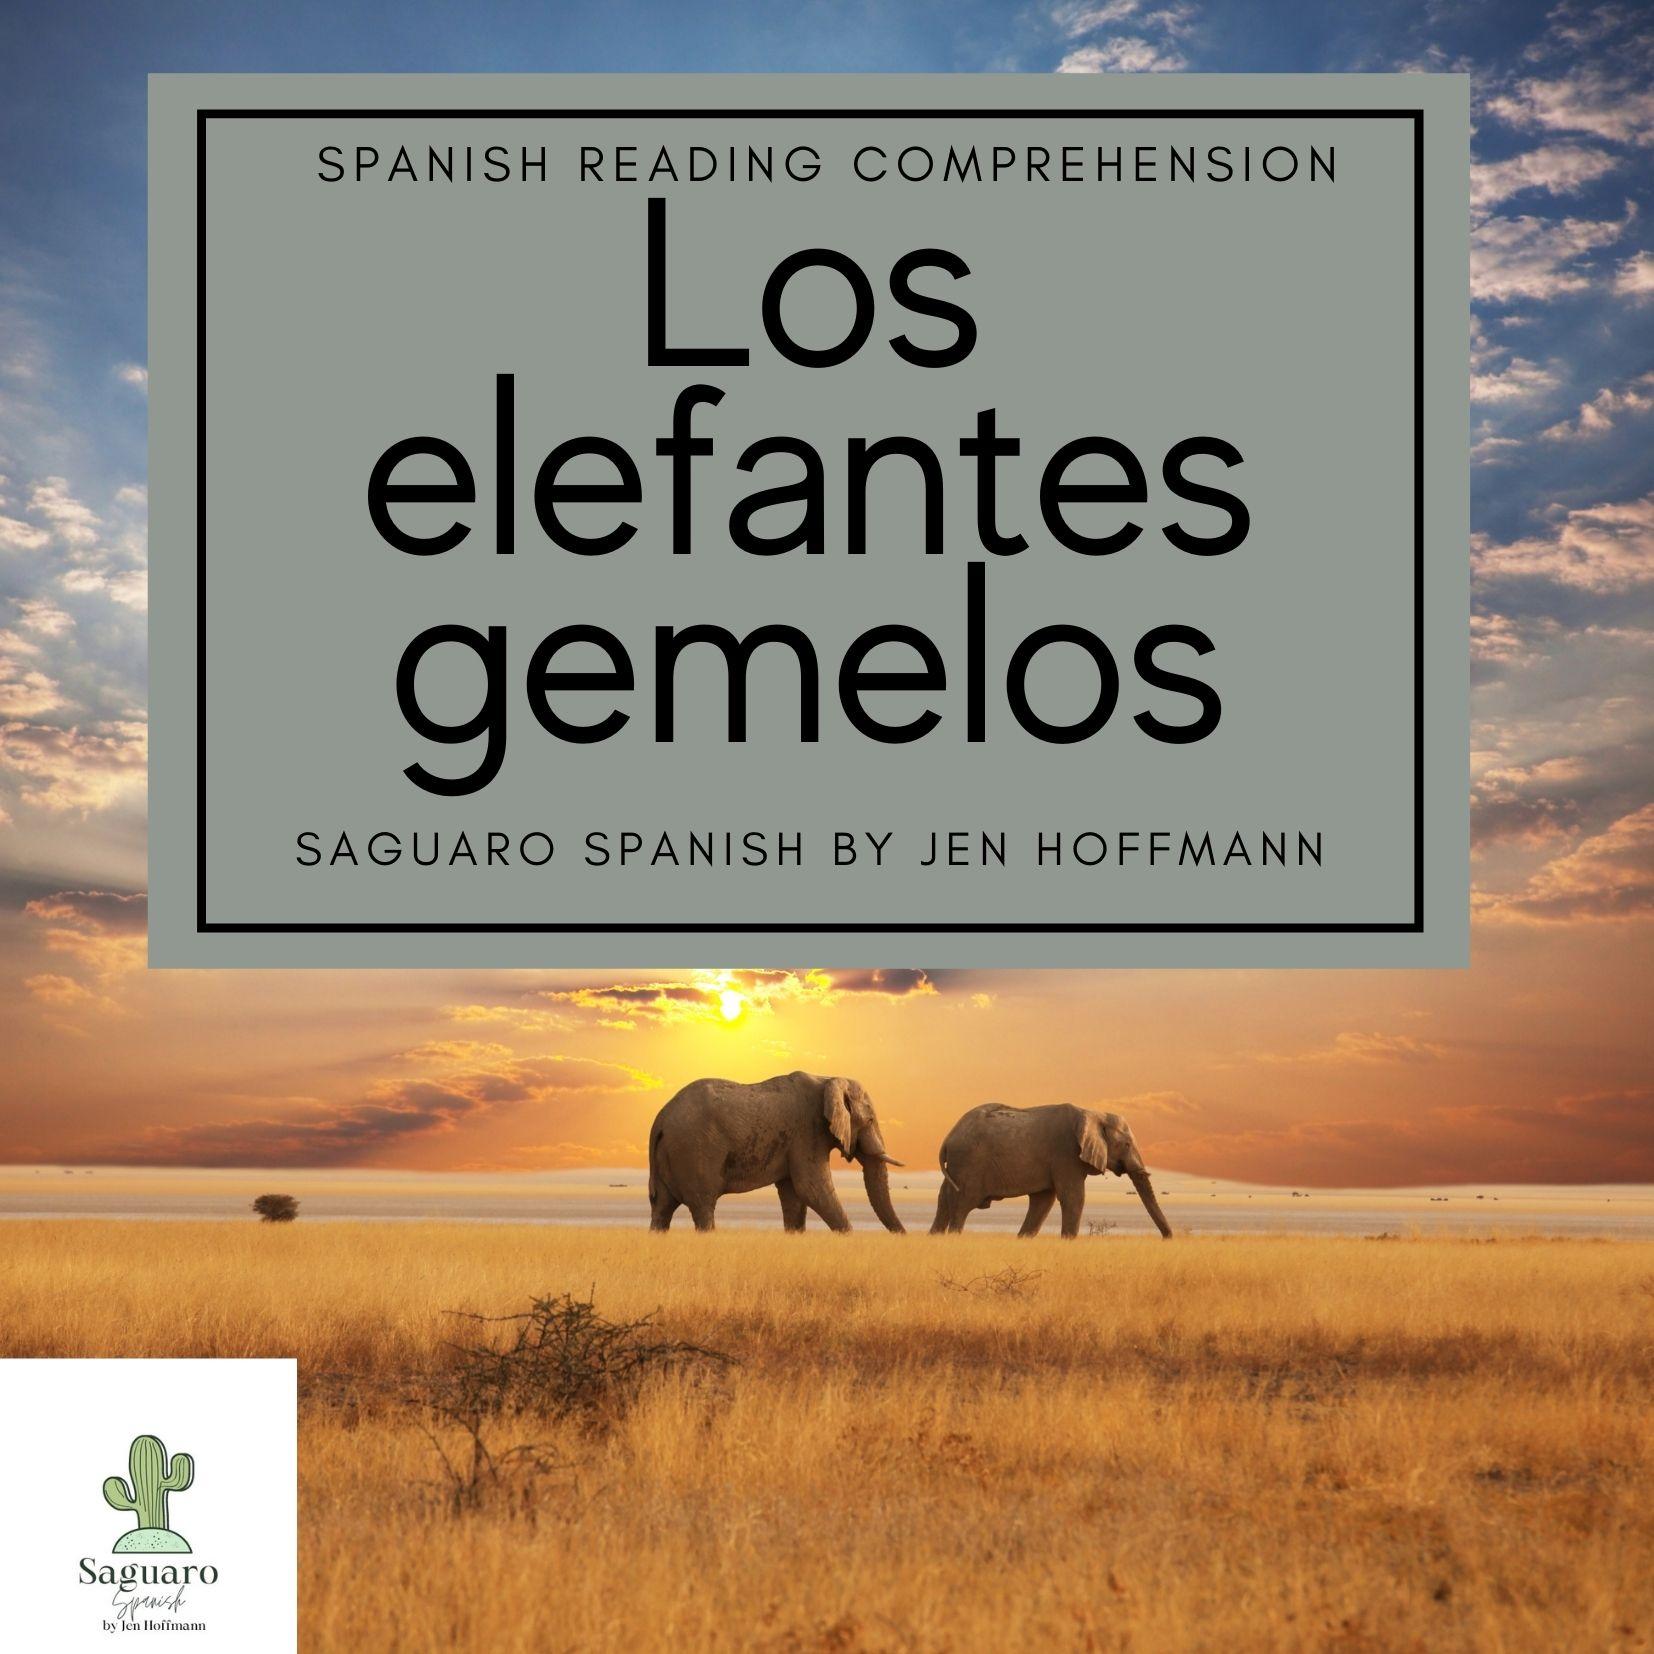 Spanish (CI) Reading Comprehension Story and Worksheet : Los elefantes gemelos